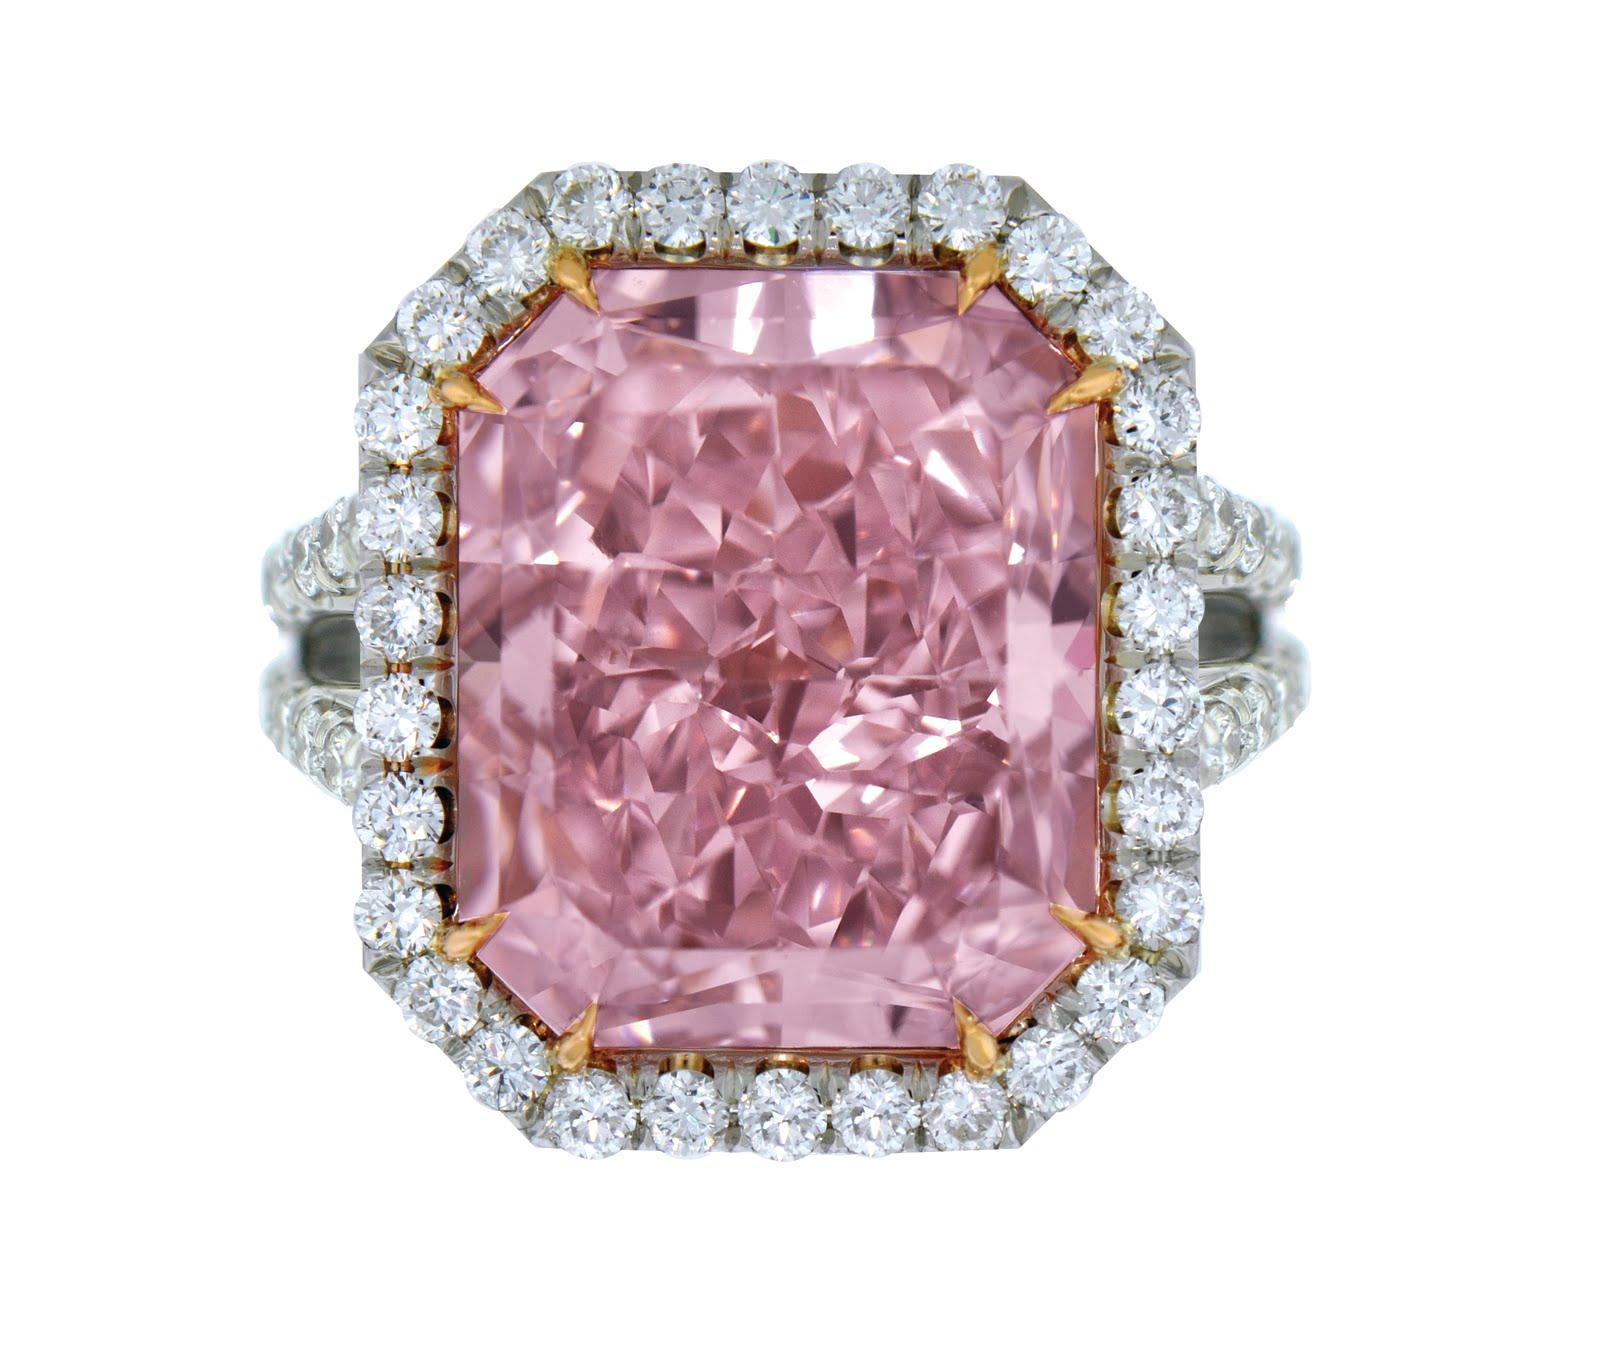 fancy-purple-pink-radiant-cut-diamond-engagement-ring.jpg